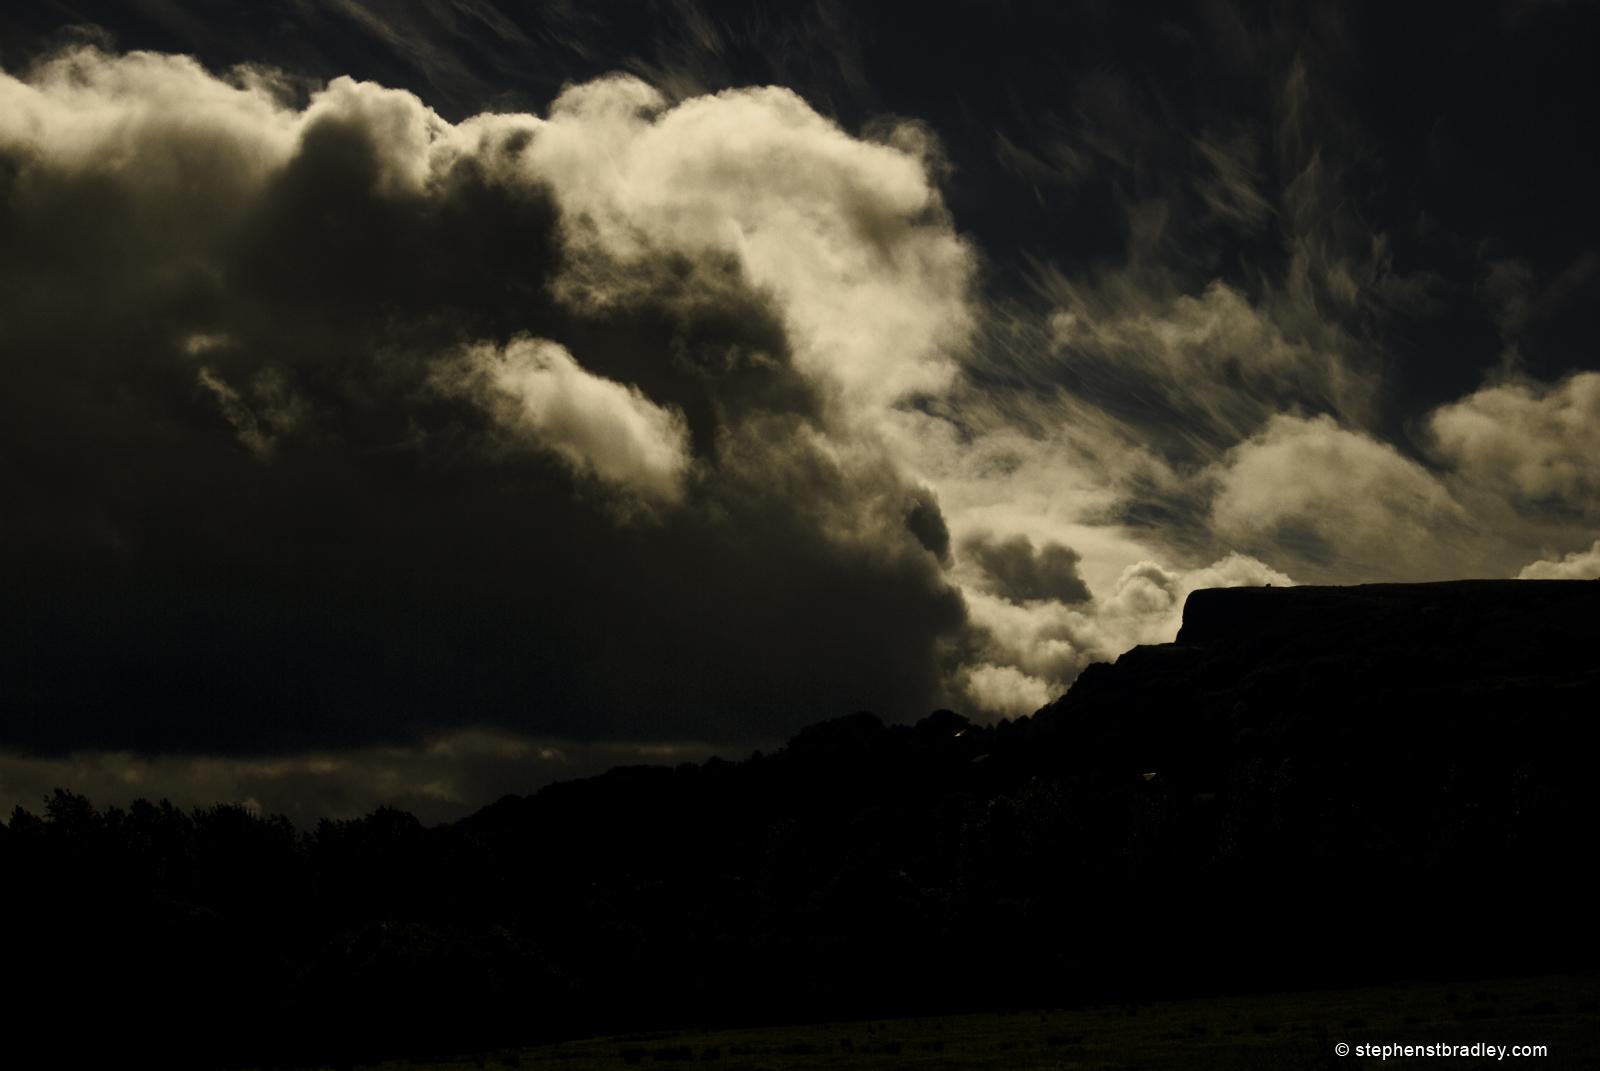 Cavehill Belfast Northern Ireland landscape photograph.